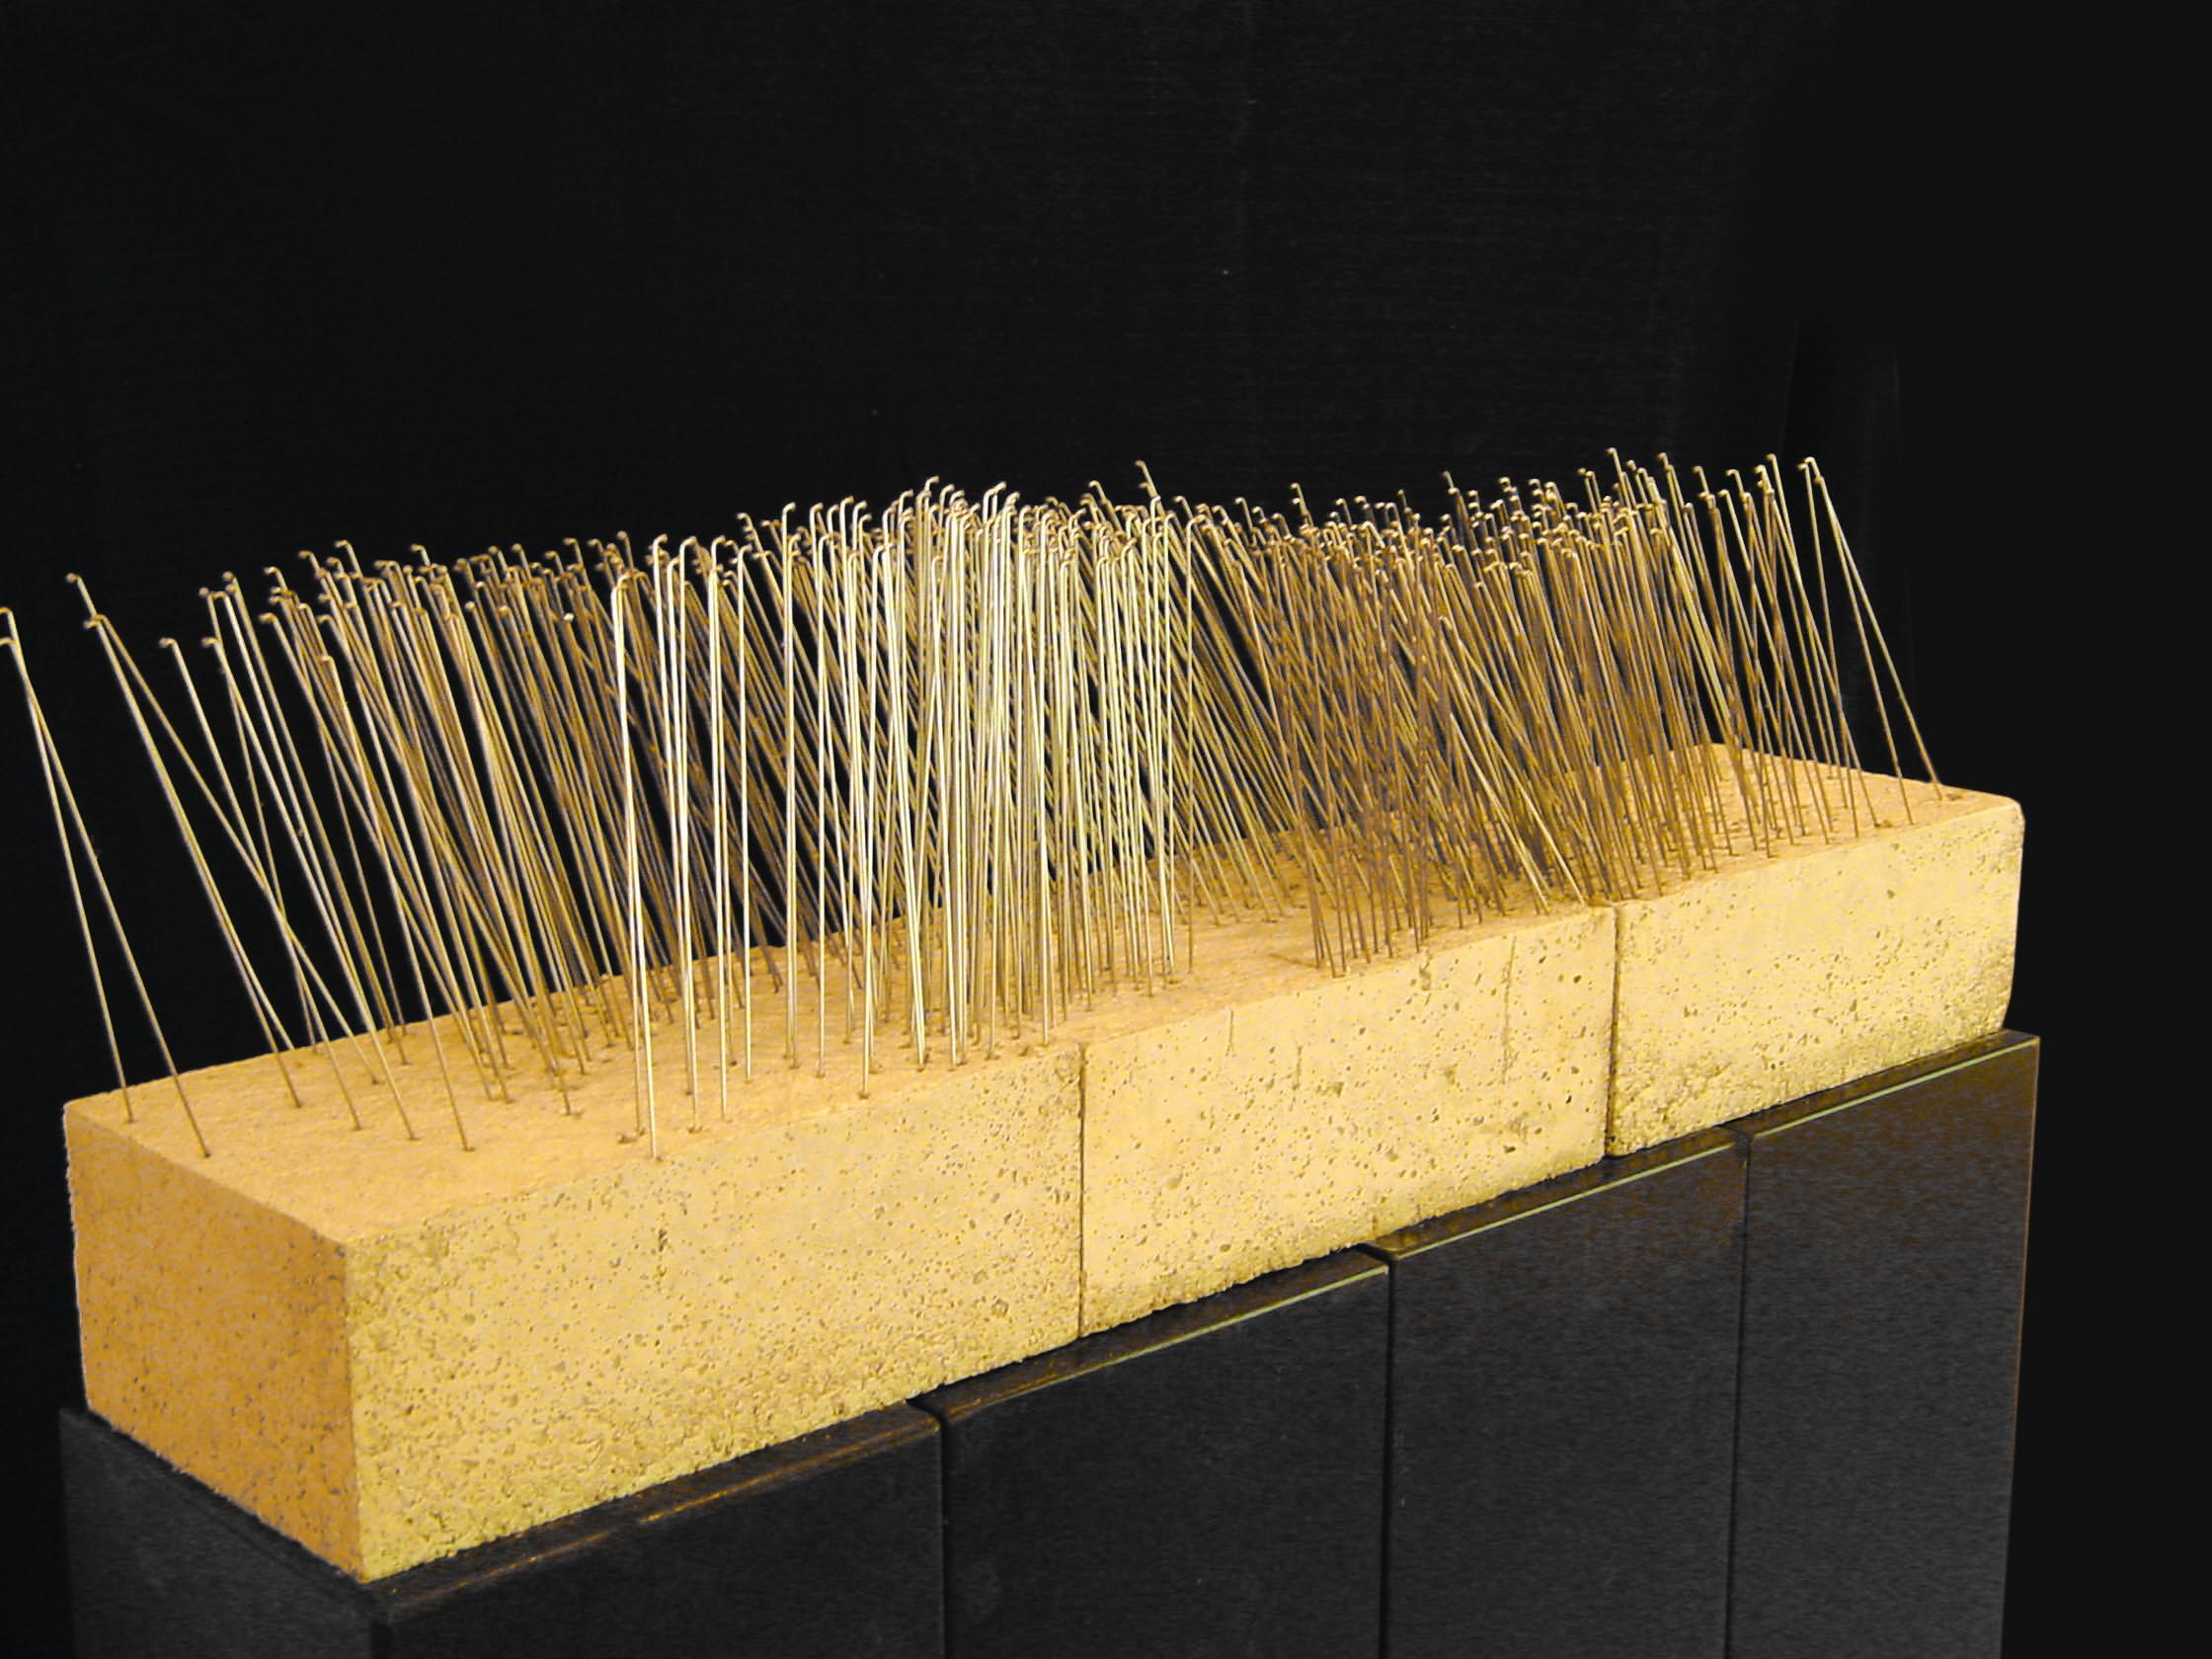 """Upheaval"", spokes, concrete, 120 x 50 x 30 cm, 2002"